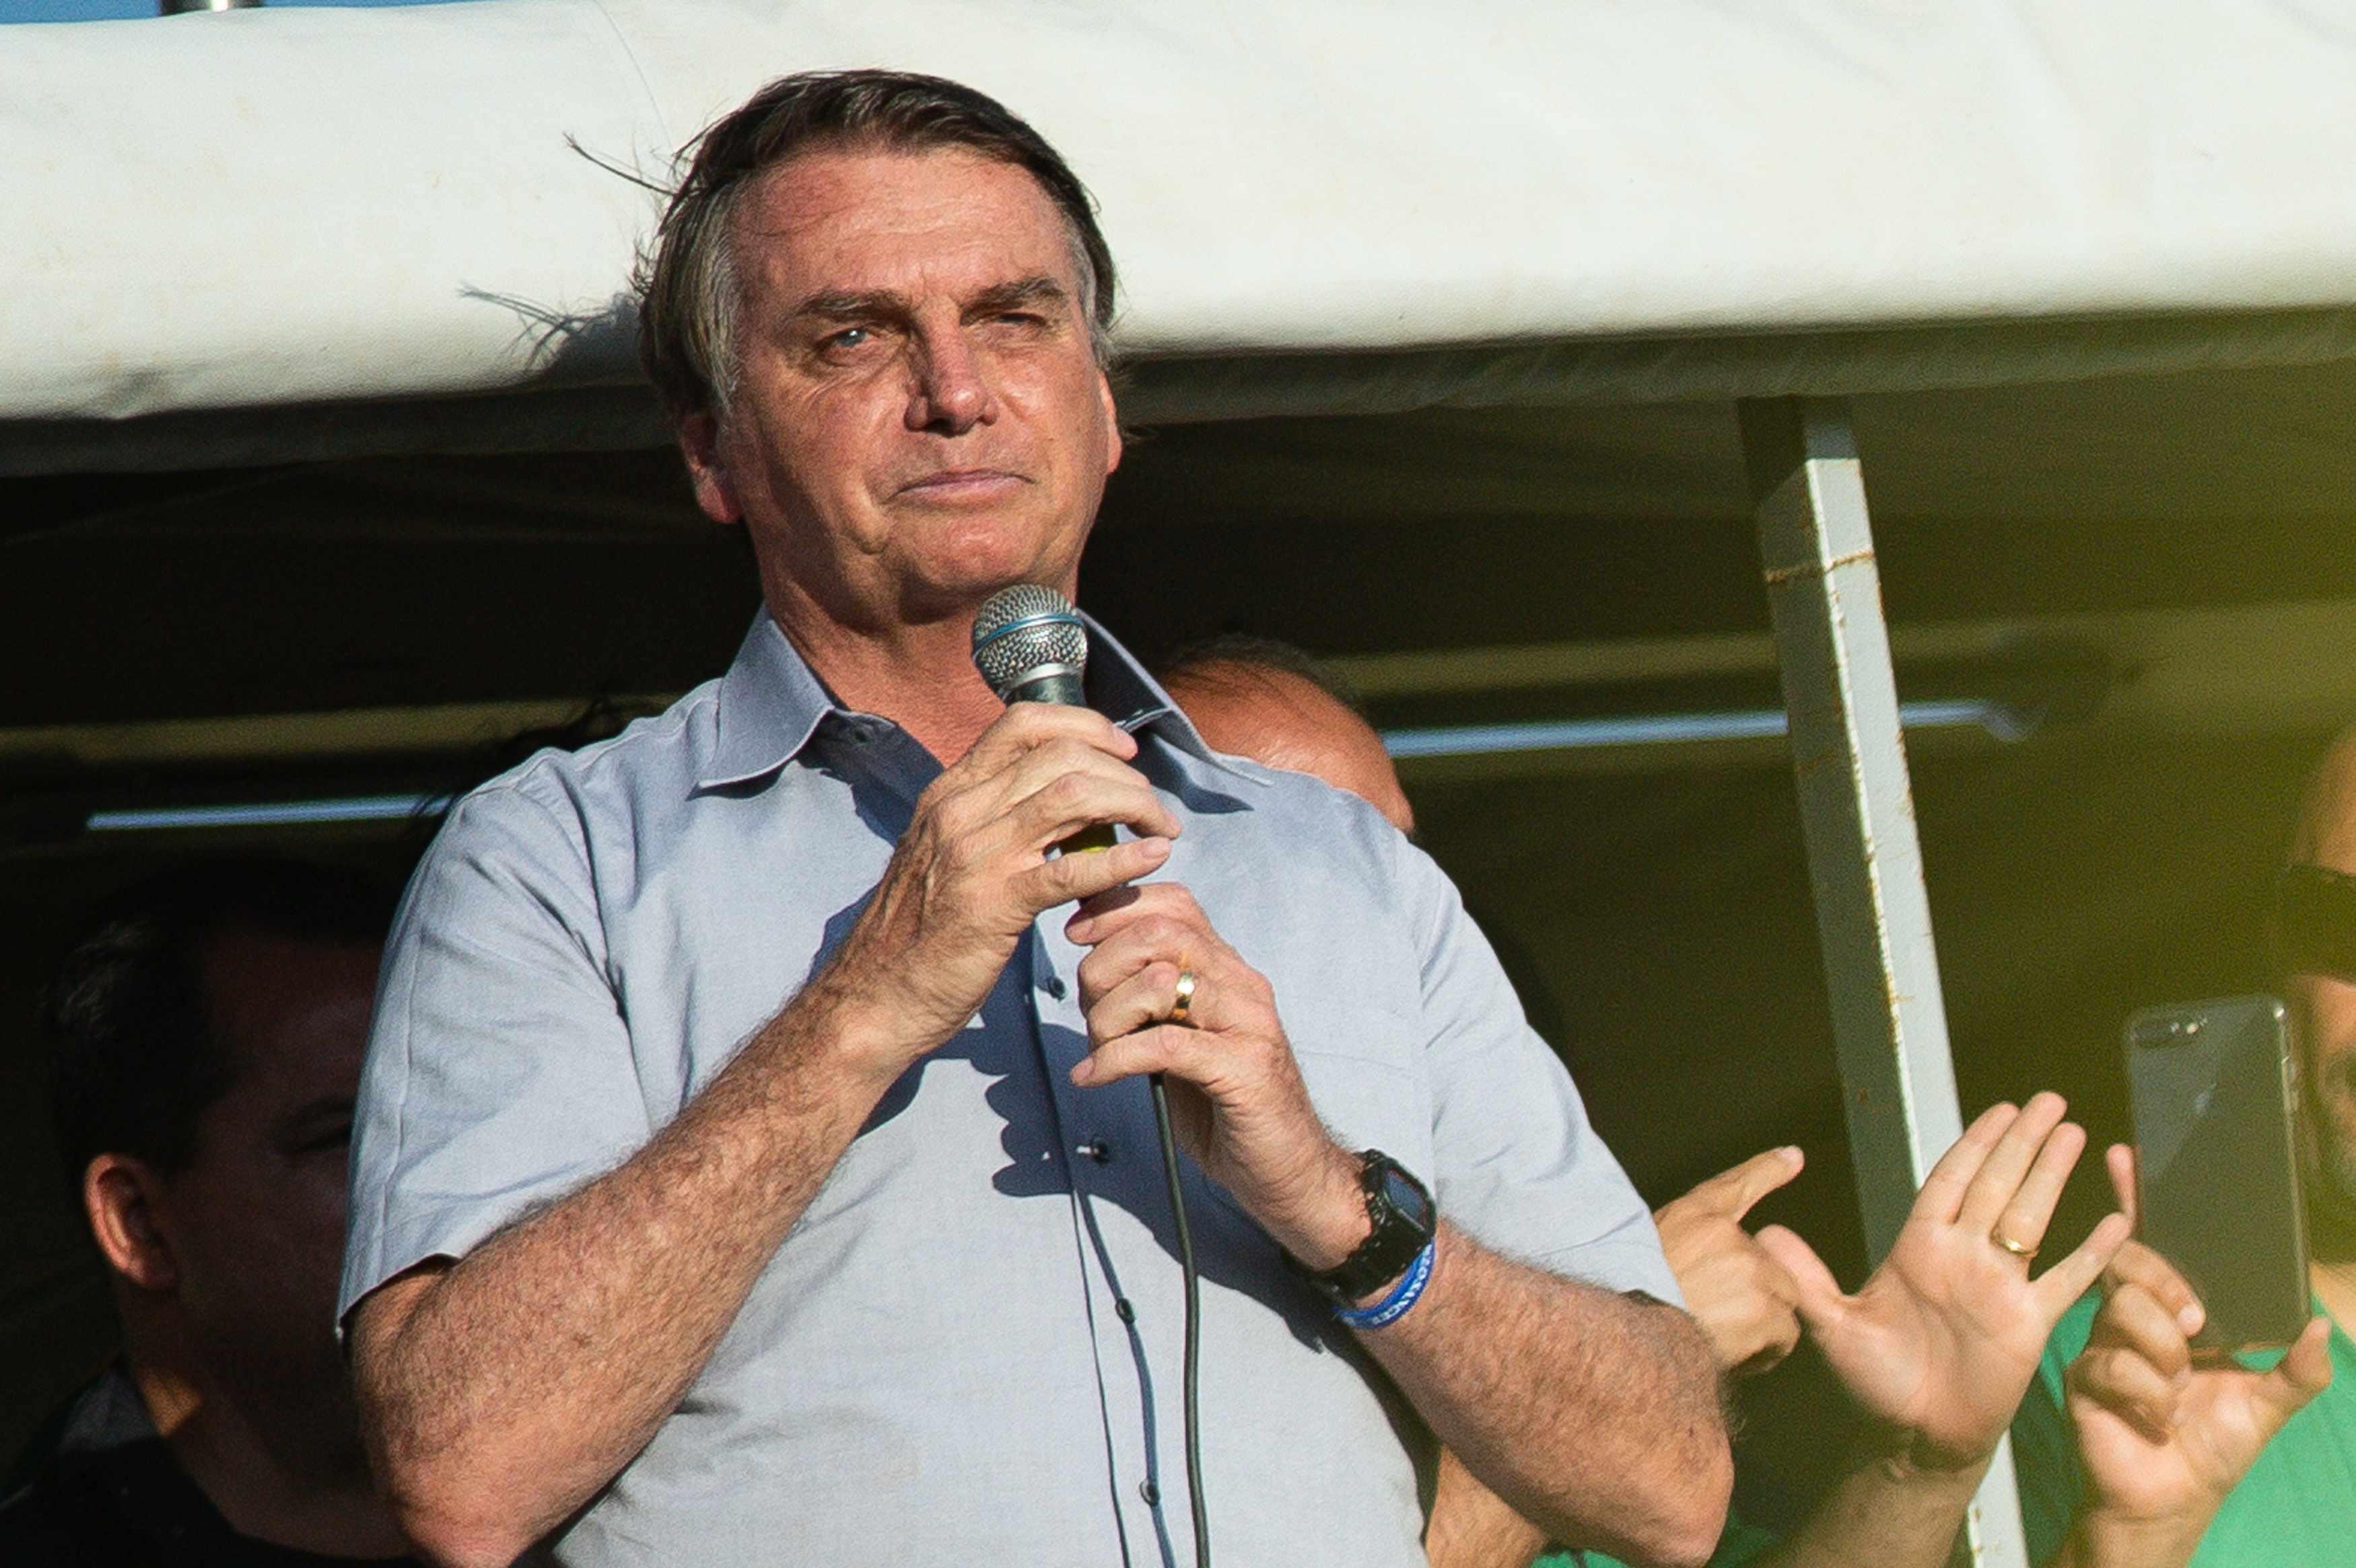 bolsonaro health jair brazilian denies